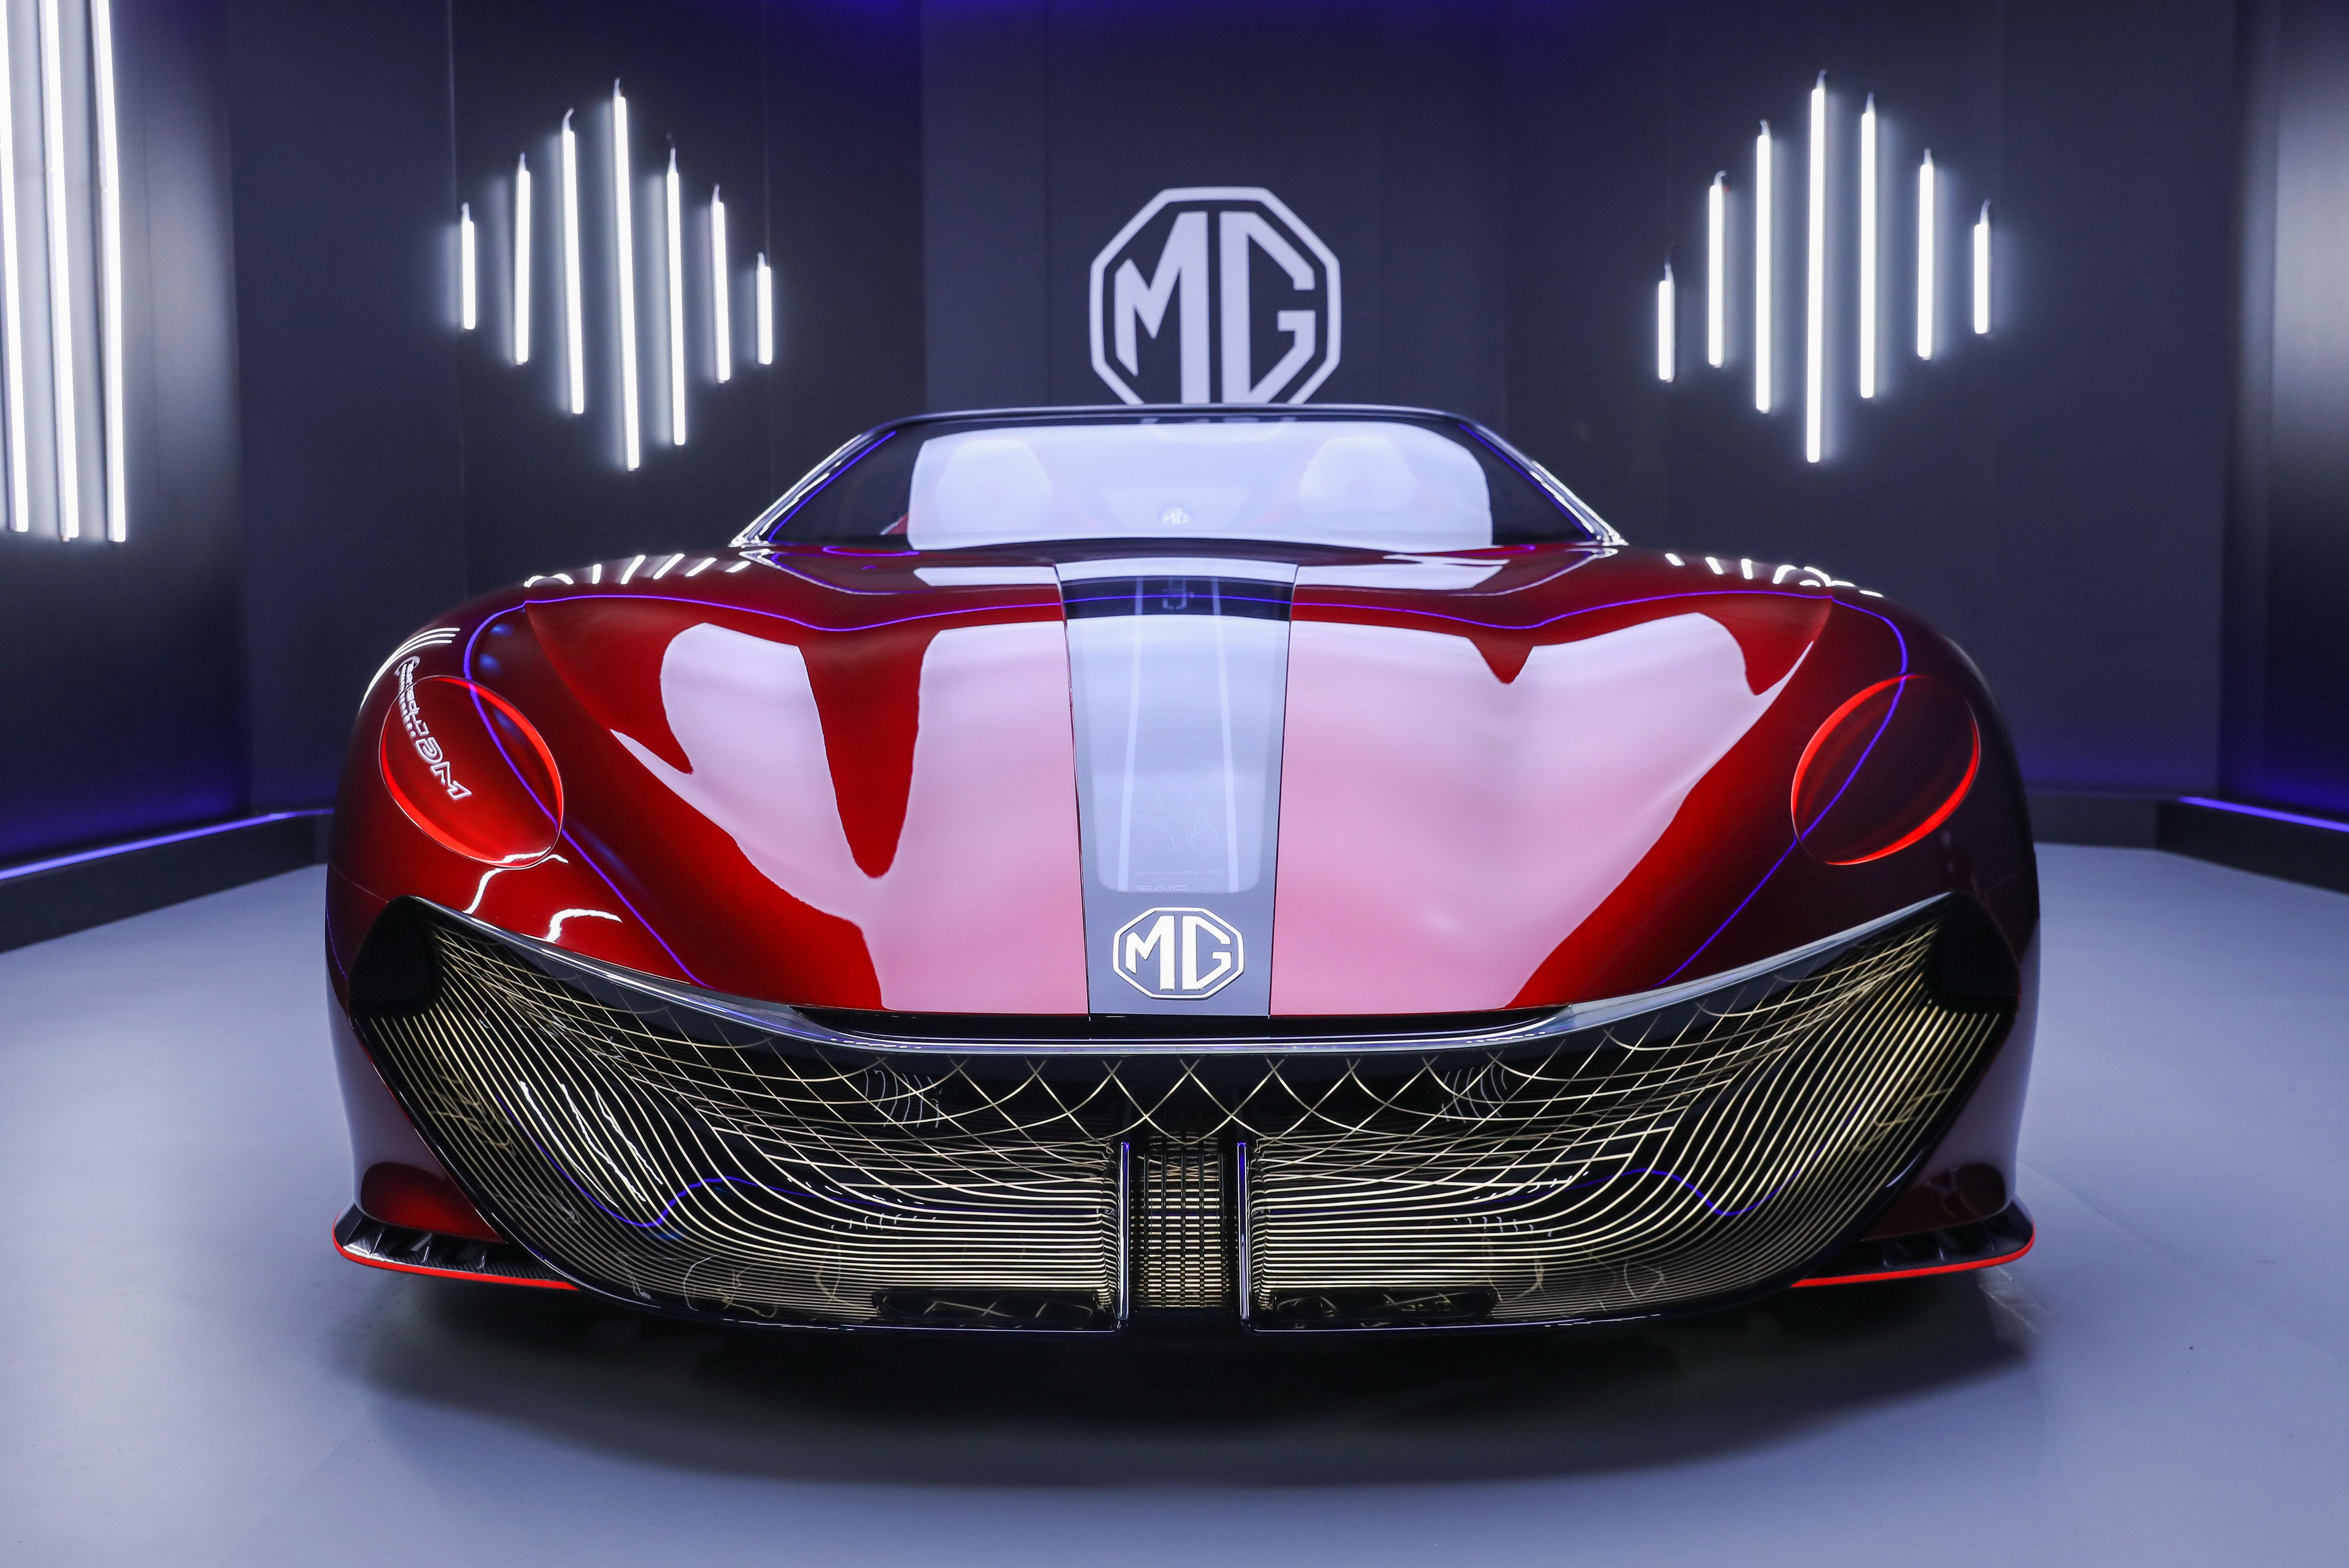 mg cyberster concept 2021 4k 1620170853 - MG Cyberster Concept 2021 4k - MG Cyberster Concept 2021 4k wallpapers